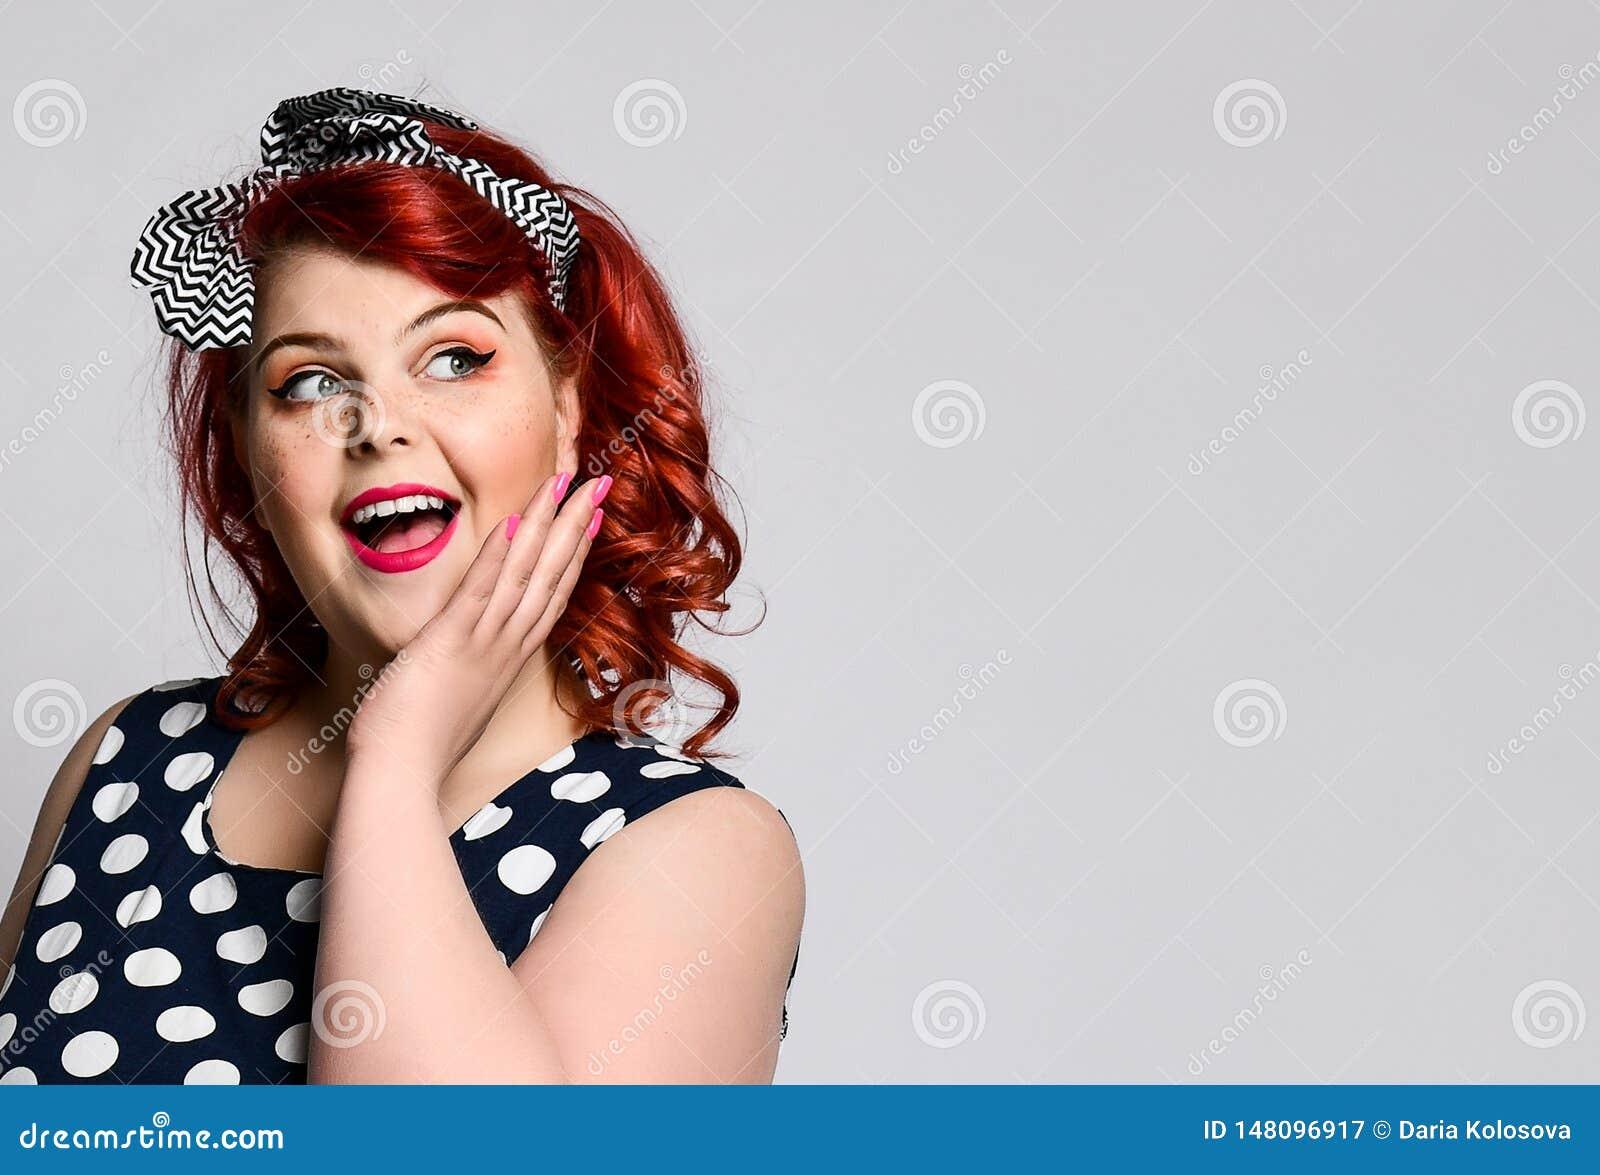 858f3434c Pin Up A Female Portrait. Beautiful Retro Fat Woman In Polka Dot ...